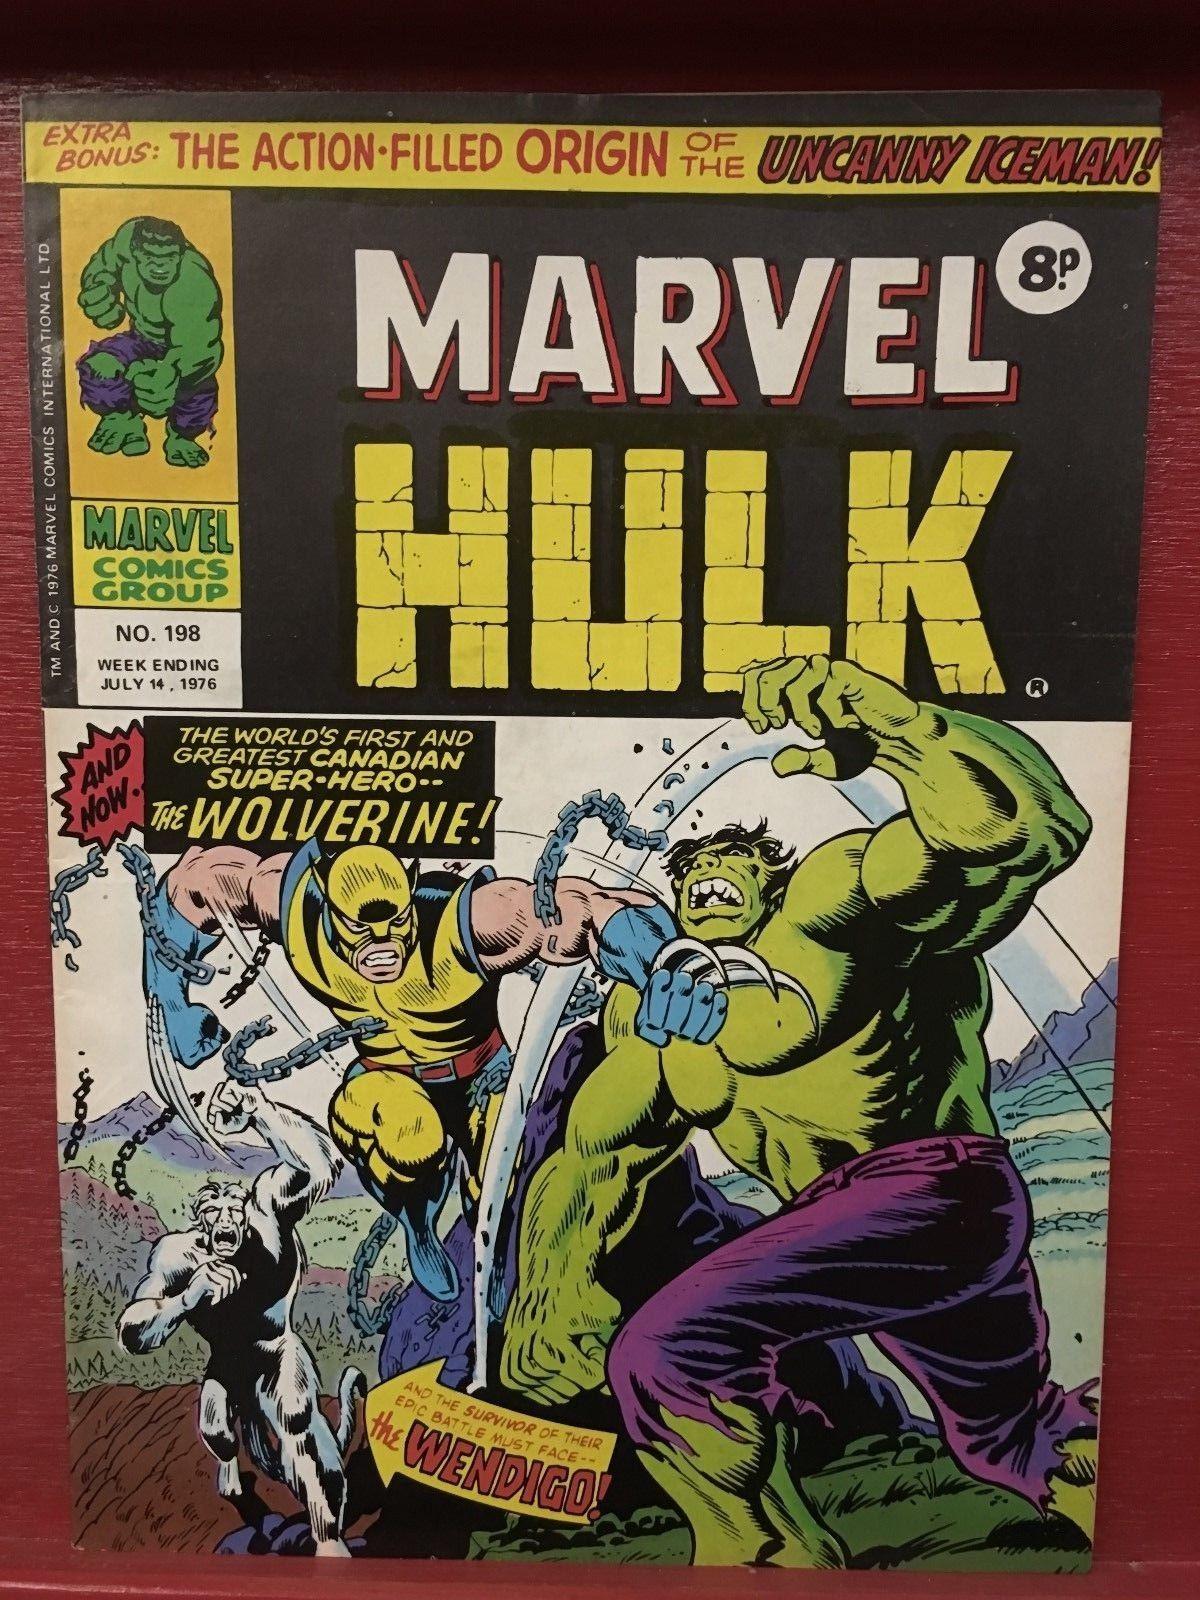 1976 UK / Mighty World Marvel #198 INCREDIBLE HULK 181 VF+* 1st WOLVERINE Rare